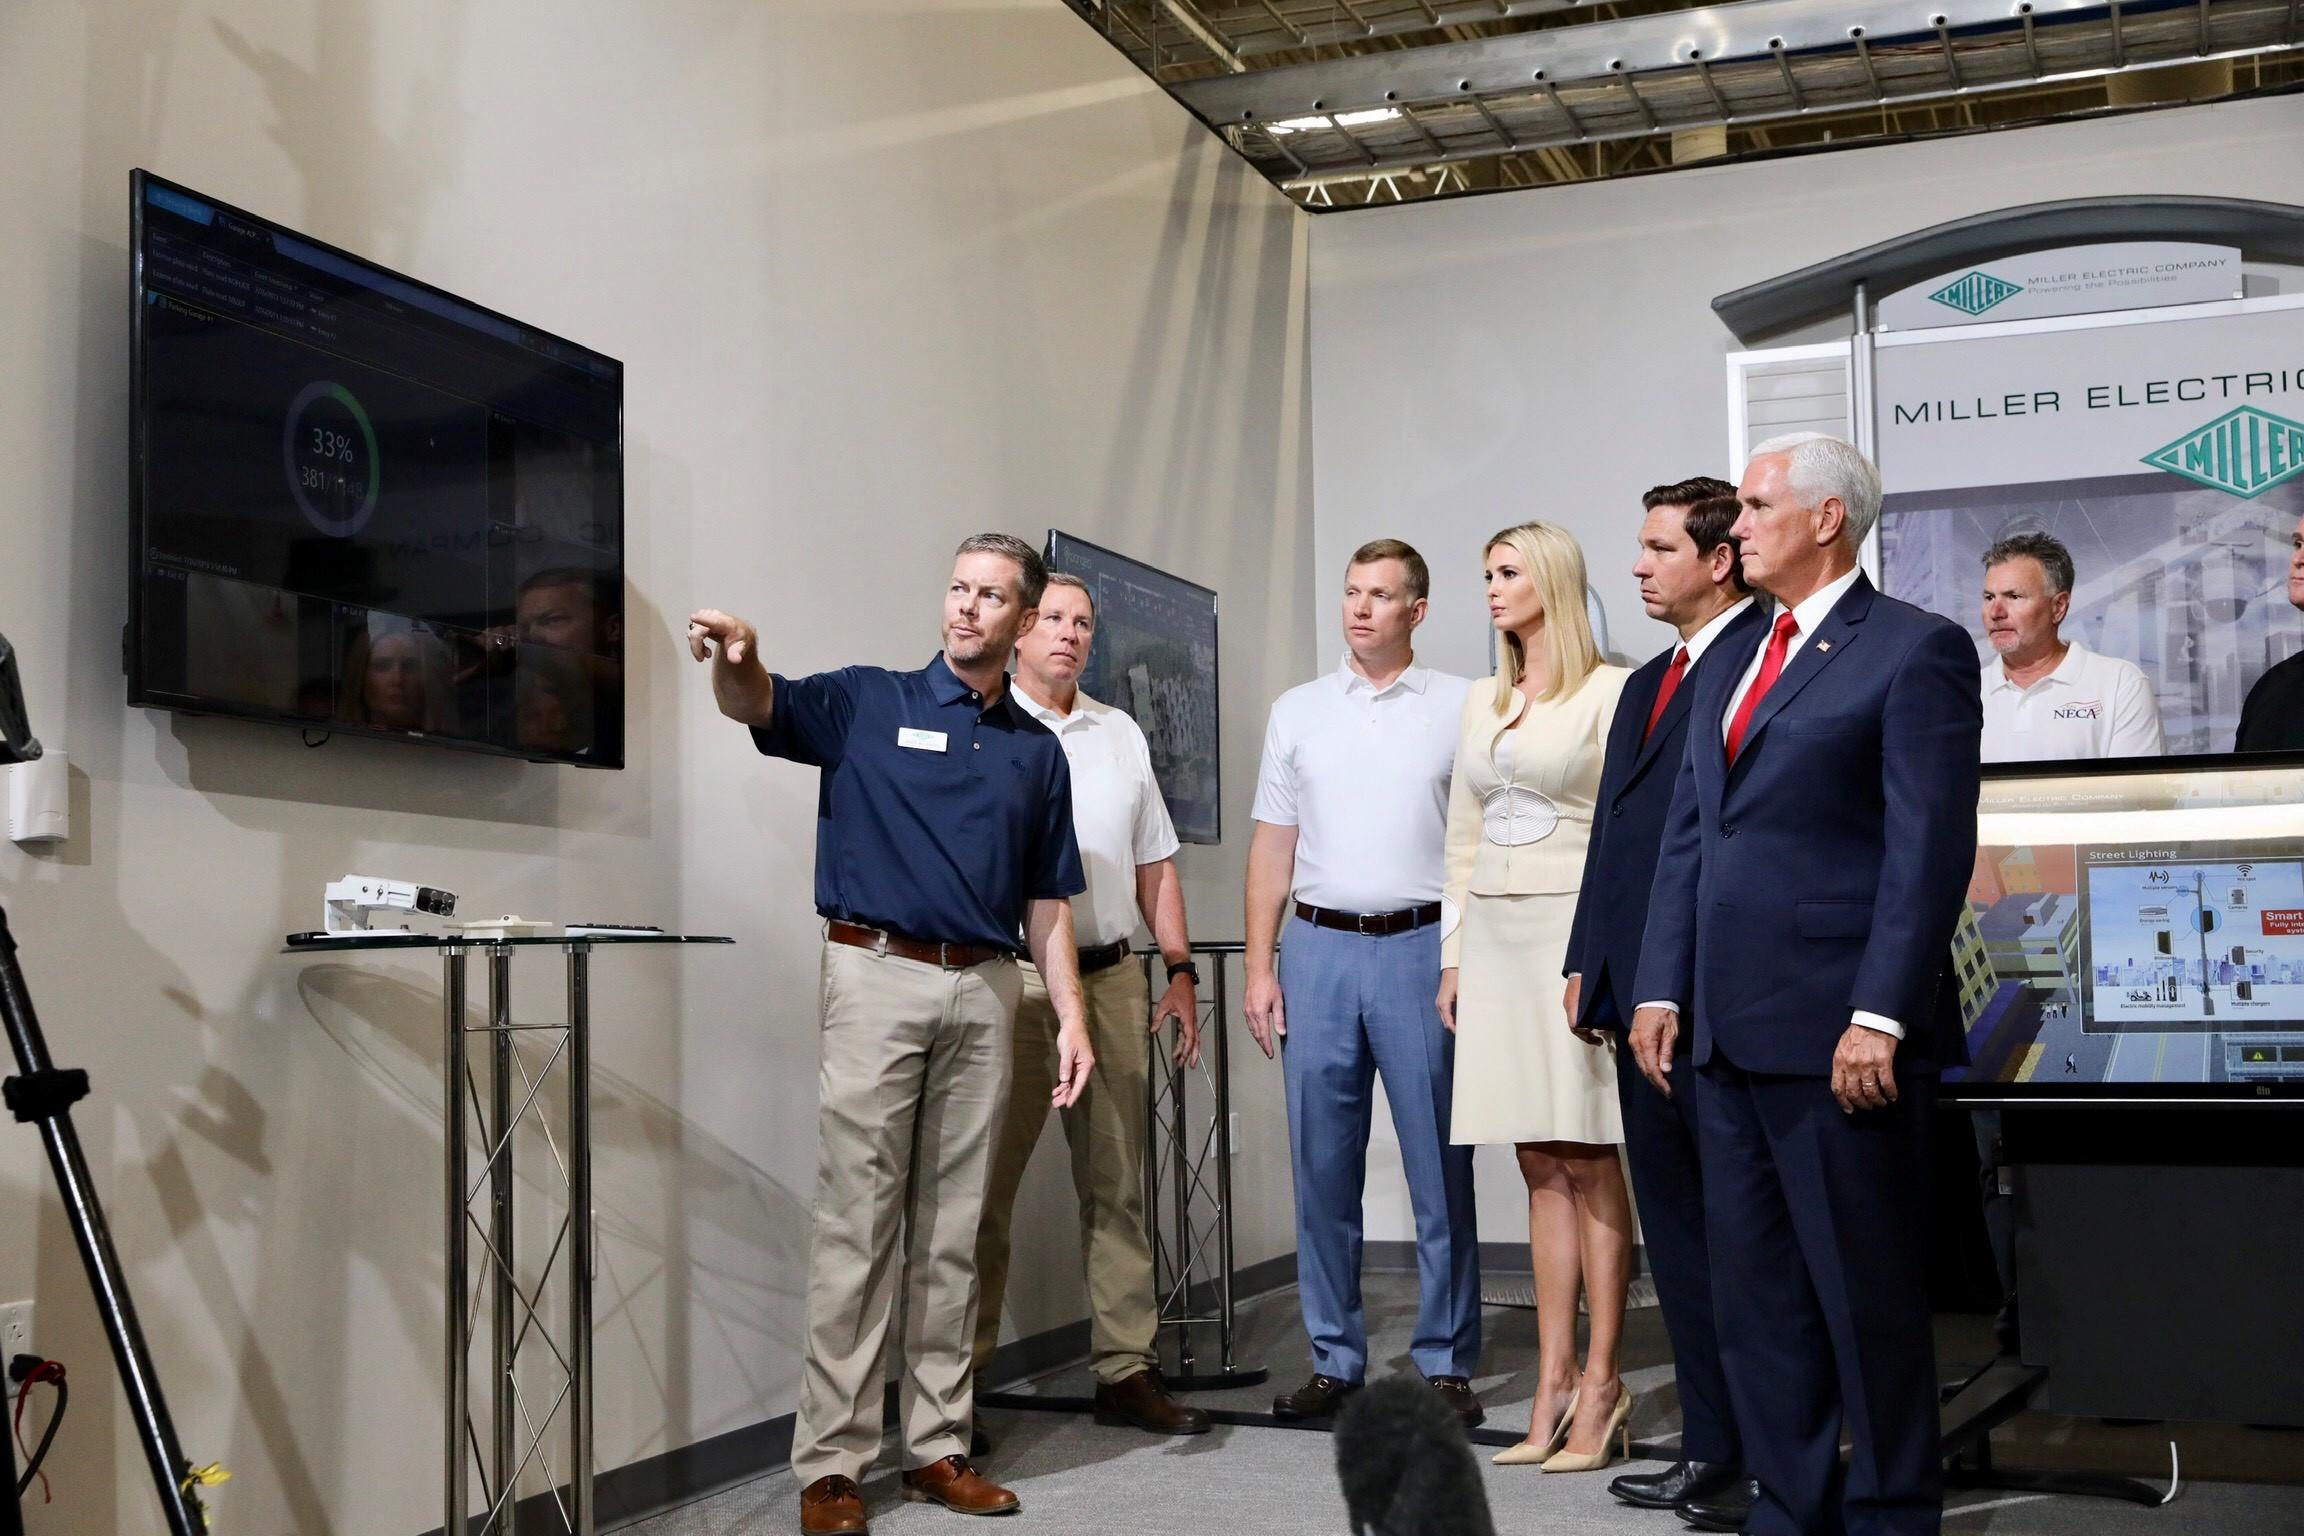 Governor Ron DeSantis Joins Vice President Pence and Ivanka